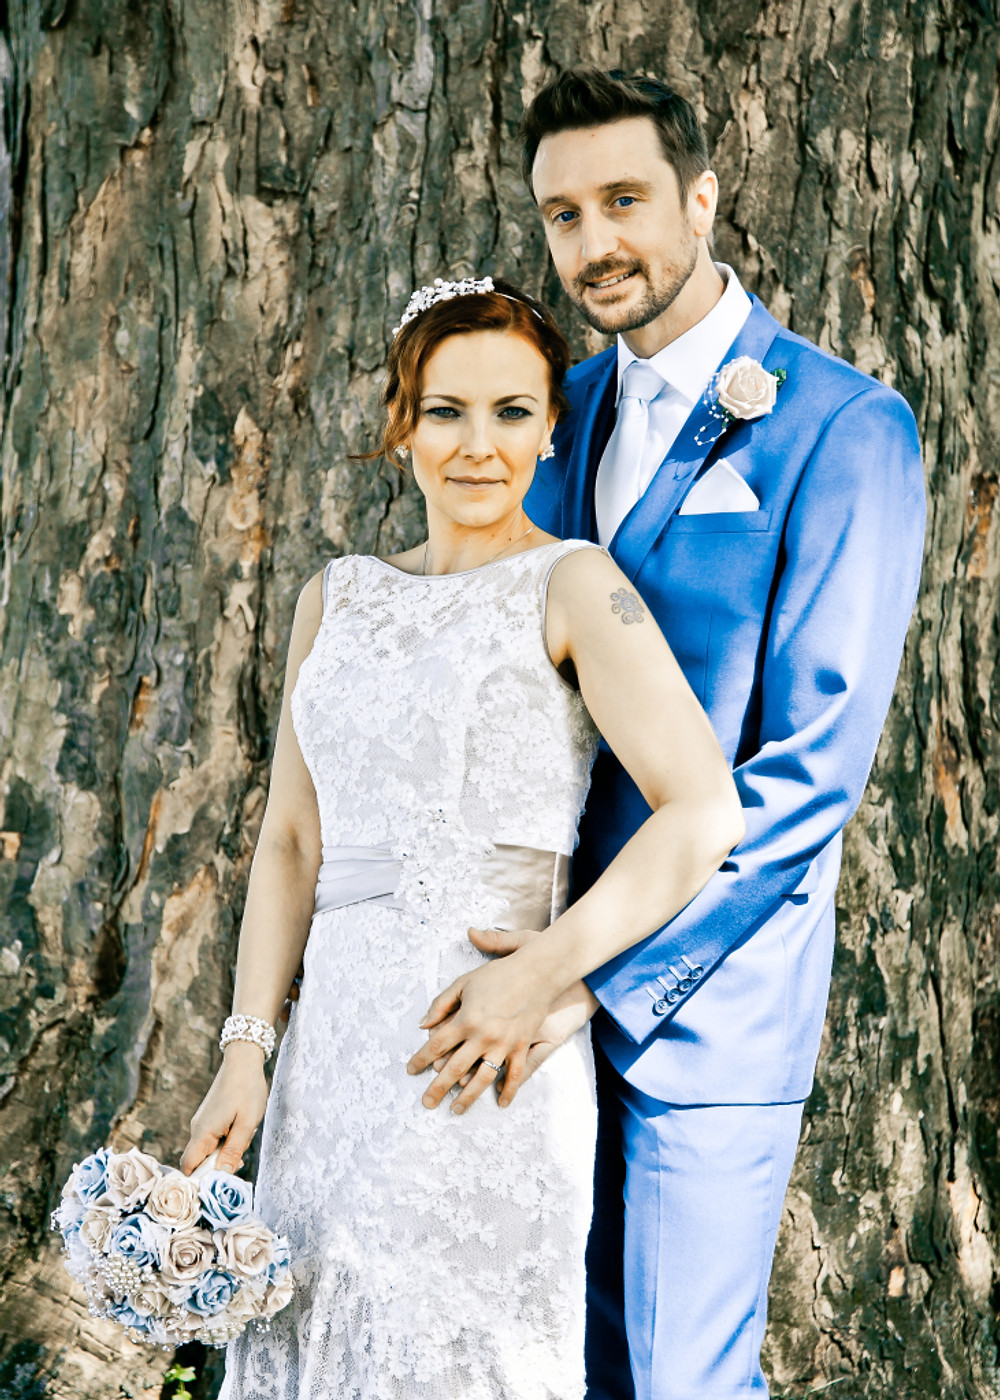 Posed Wedding photography in Teessi